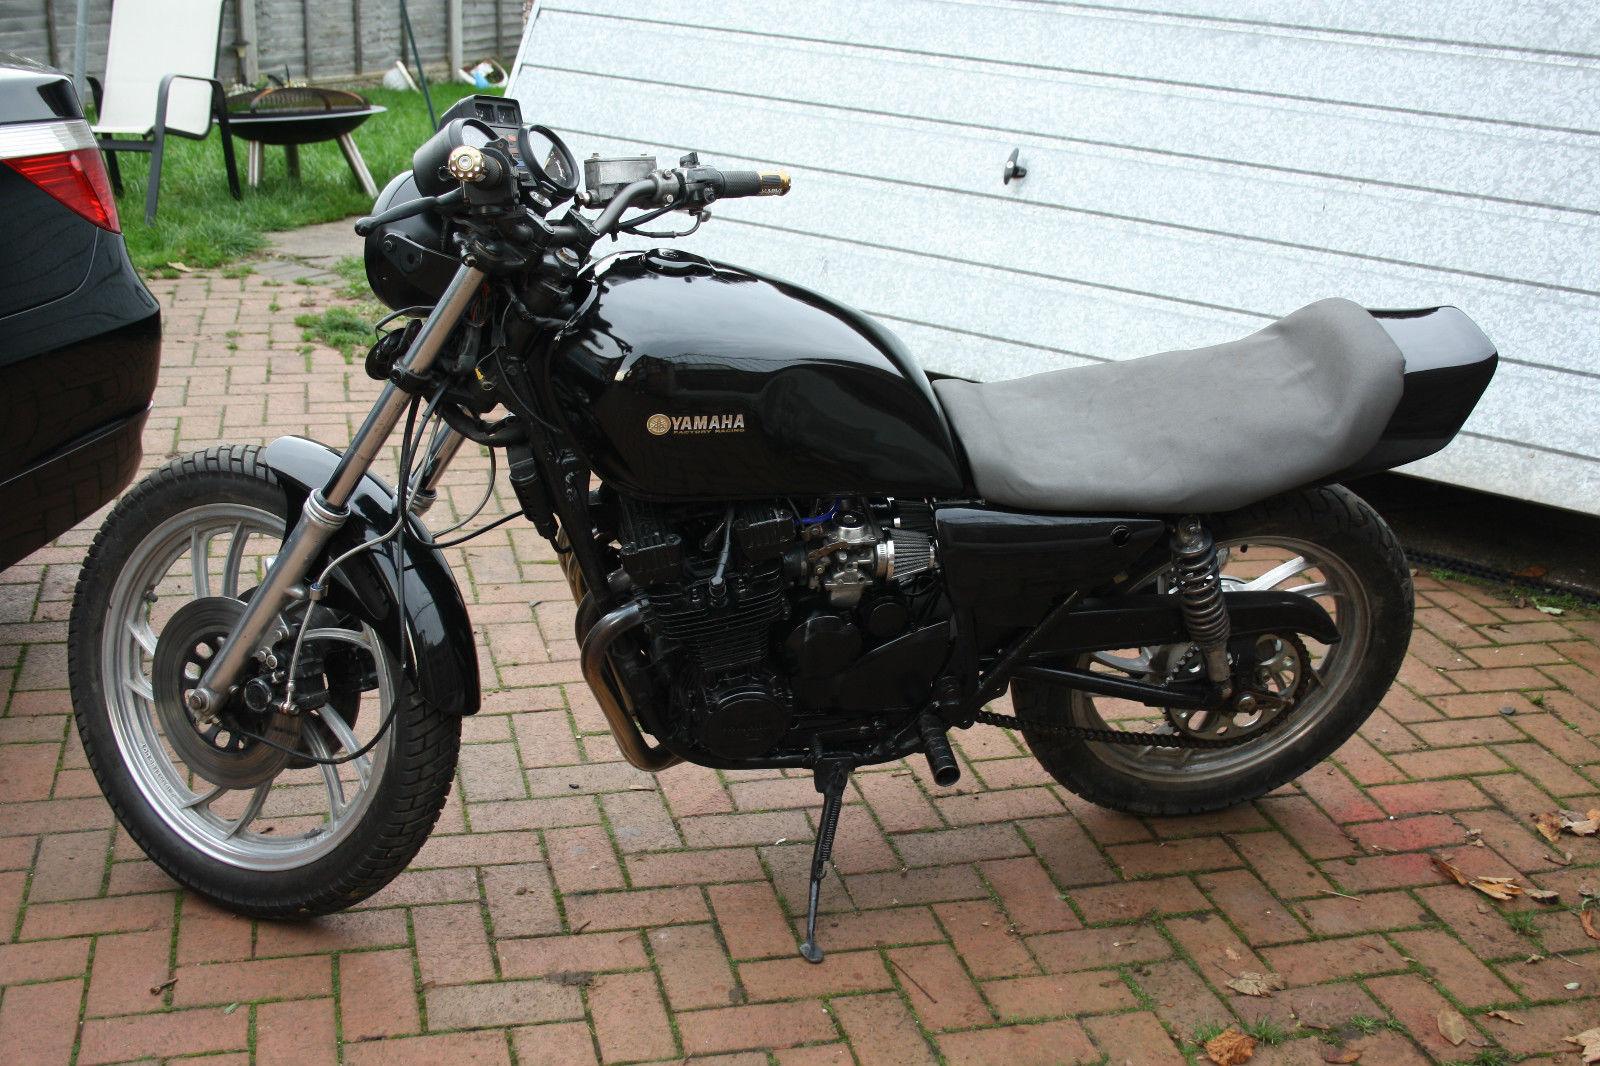 1981 yamaha xj550 black cafe racer  flat tracker  twin shock xj550 service manual yamaha xj 550 repair manual